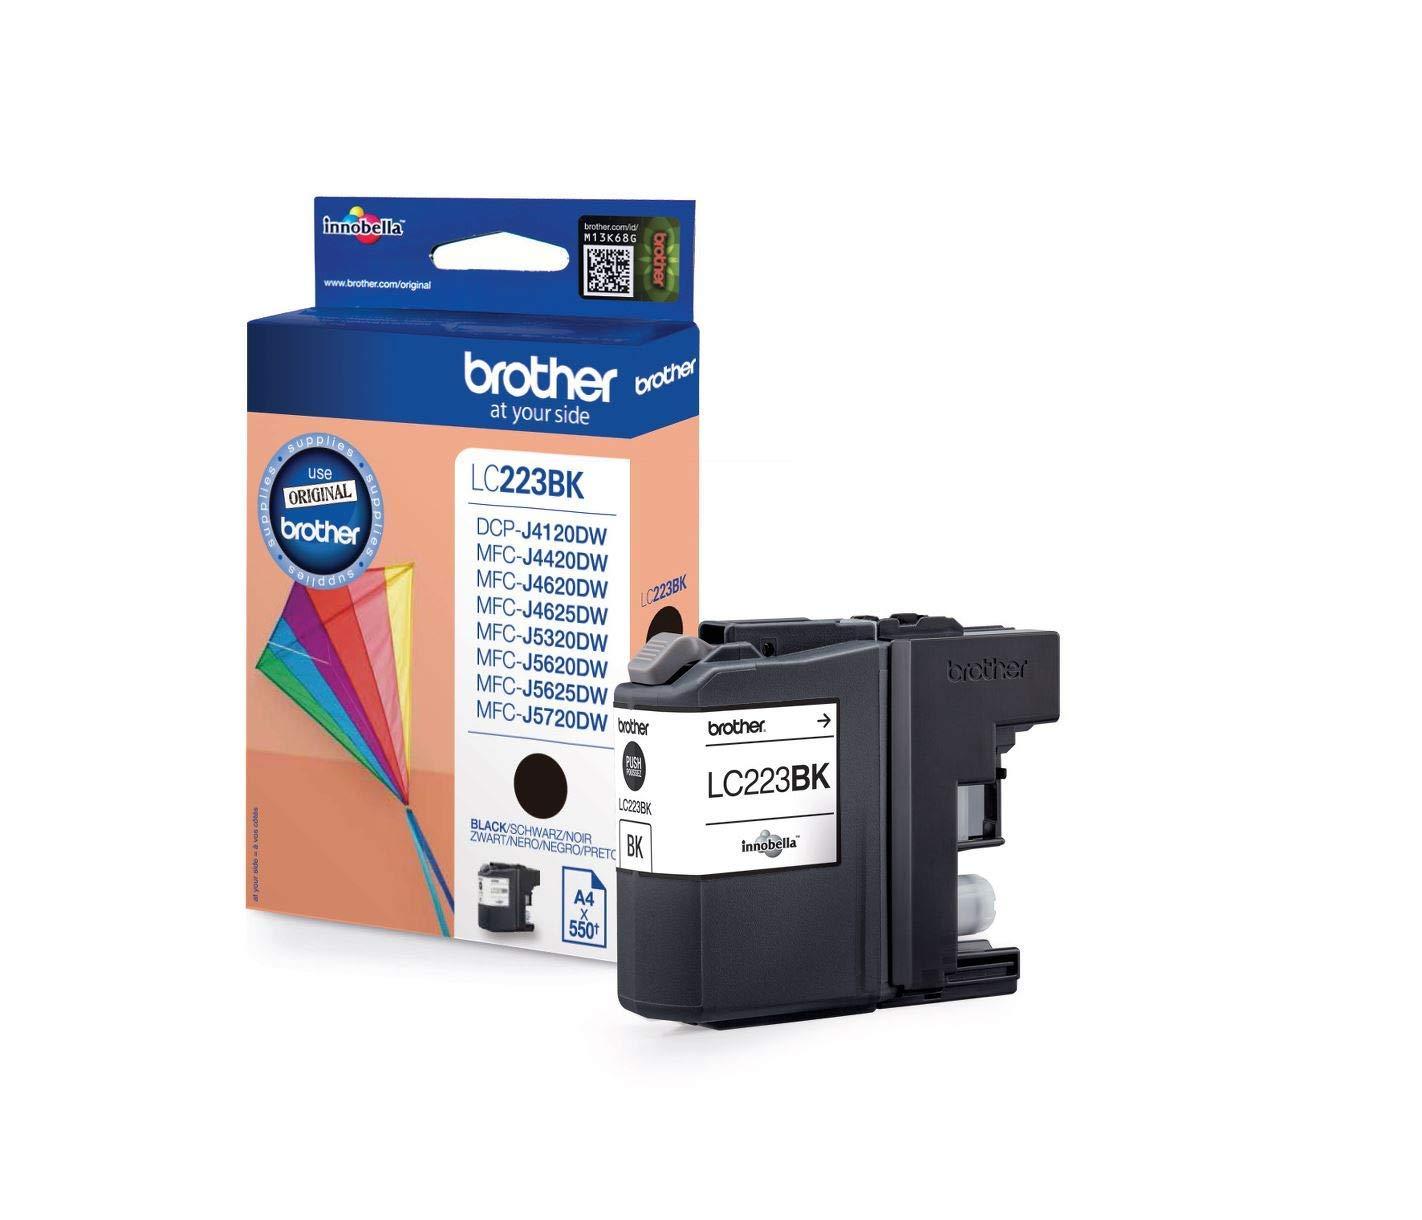 Original Brother Cartucho de tinta LC221 LC 221 LC-221 para Brother MFC J 1100 Series - NEGRO - potencia: Aprox. 260 Lados - (05) 4x Cartucho de tinta ...